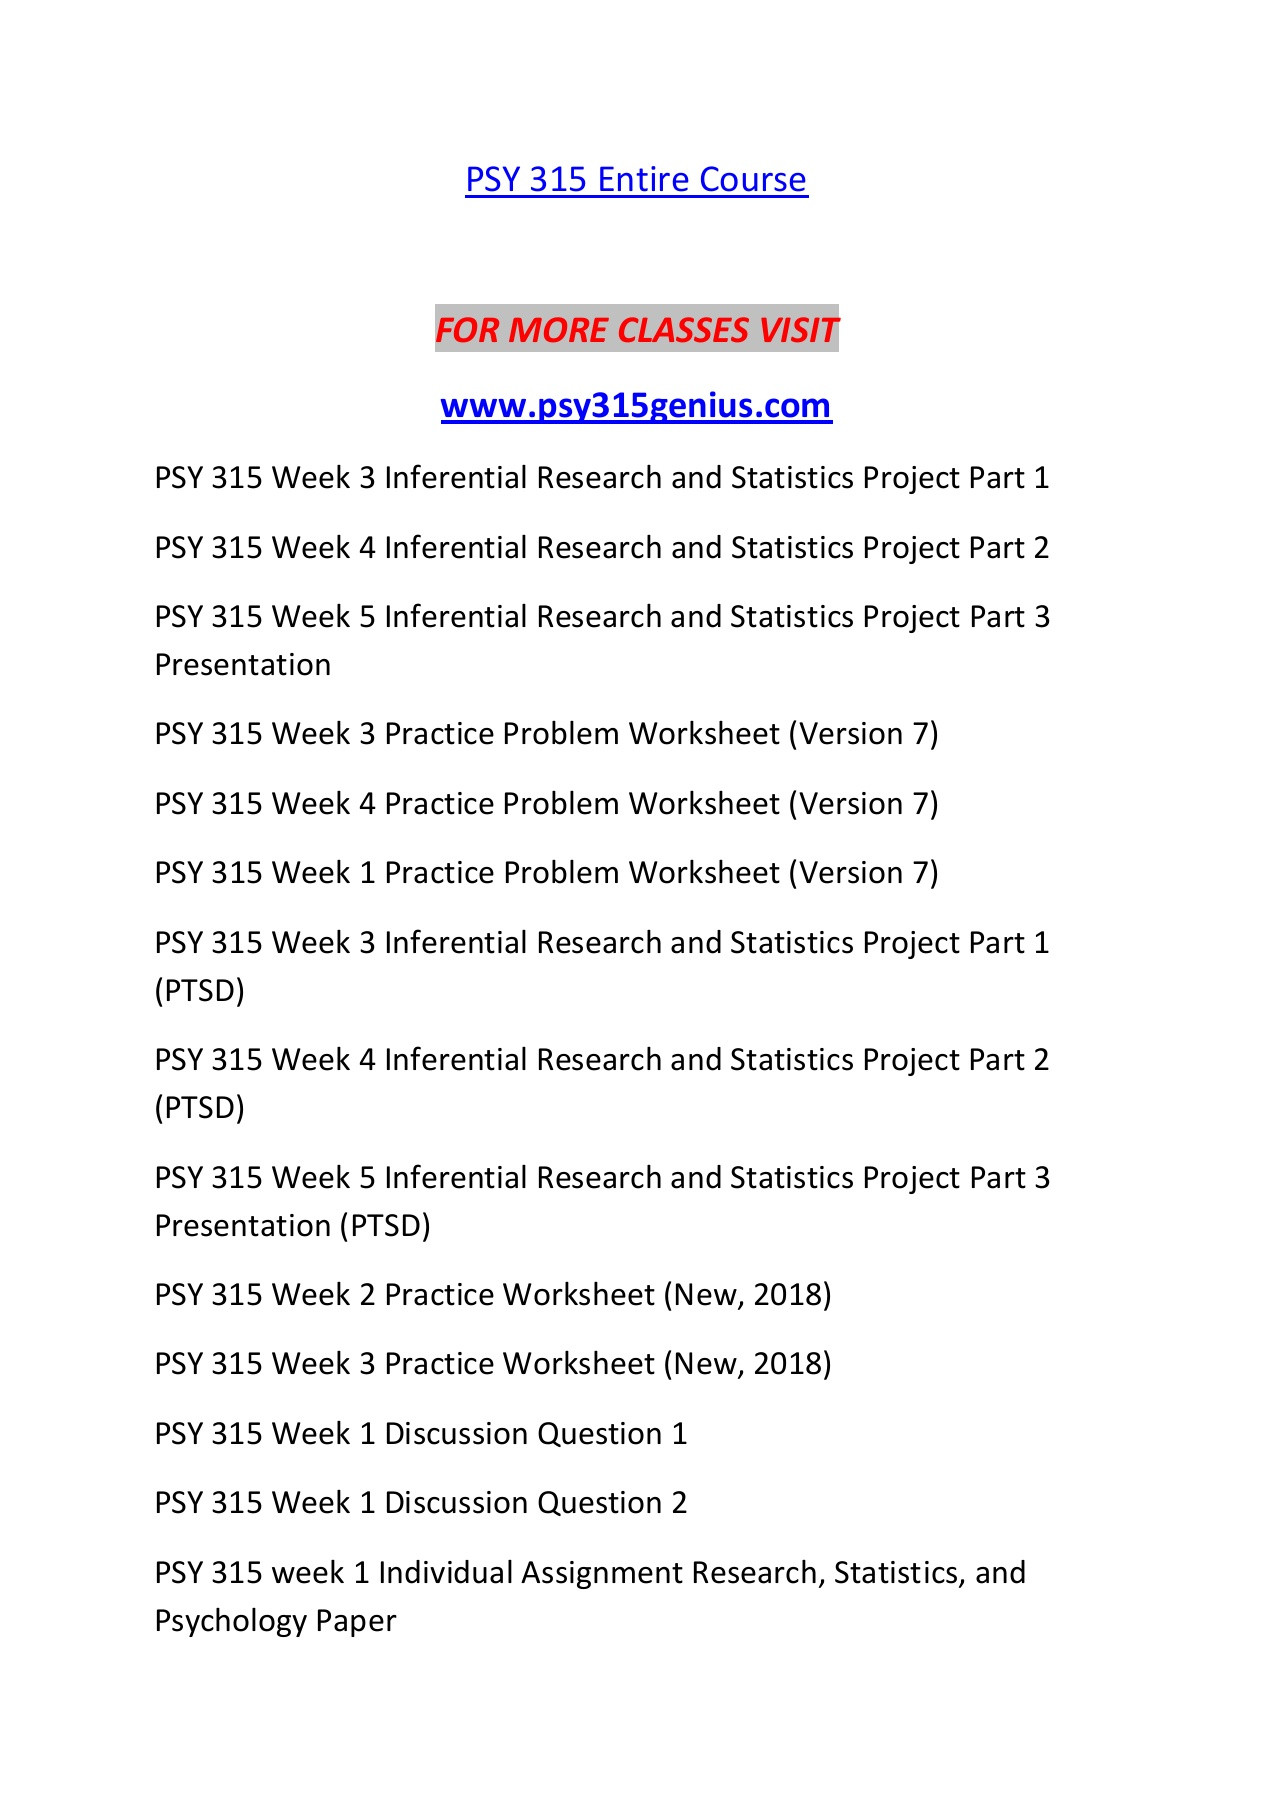 Z Score Practice Worksheet Psy 315 Genius Knowledge Specialist Psy315genius Pages